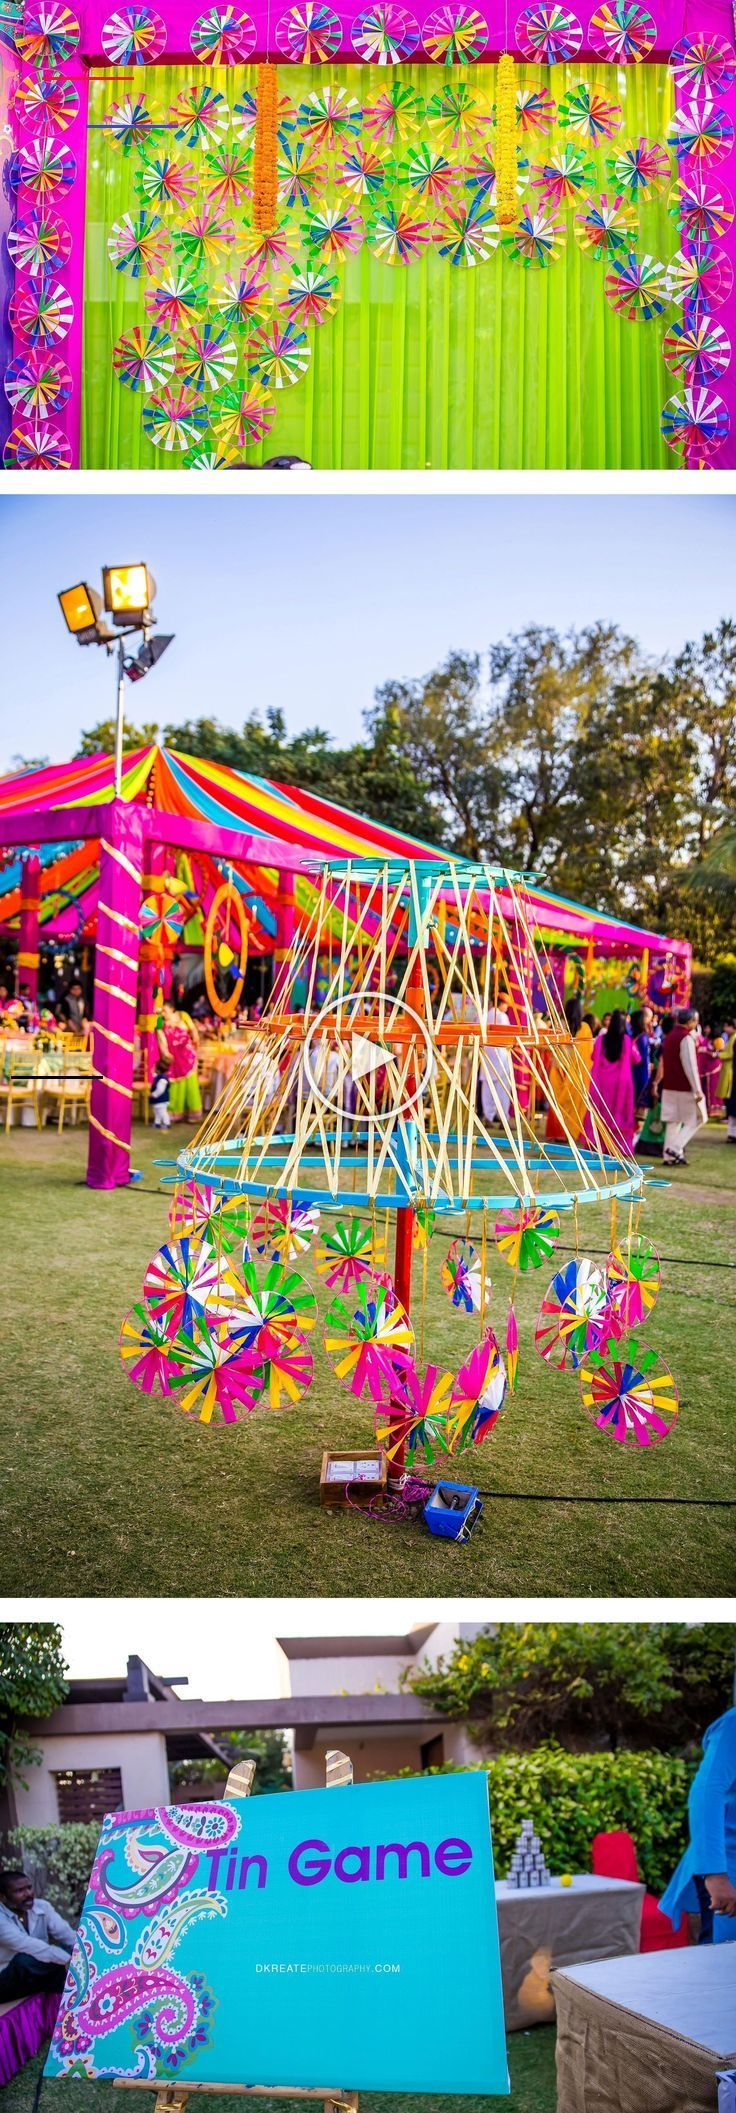 Indian Wedding Decor Inspiration |  Indian wedding backdrop ideas. Colorful. Mel... Indian Wedding Decor Inspiration | Indian wedding backdrop ideas. Colorful. Mel... Indian Wedding Decor Inspiration | In...  #Backdrop #Colorful #decor #indian wedding backdrop Indian Wedding Decor Inspiration |  Indian wedding backdrop ideas. Colorful. Mel...<br>